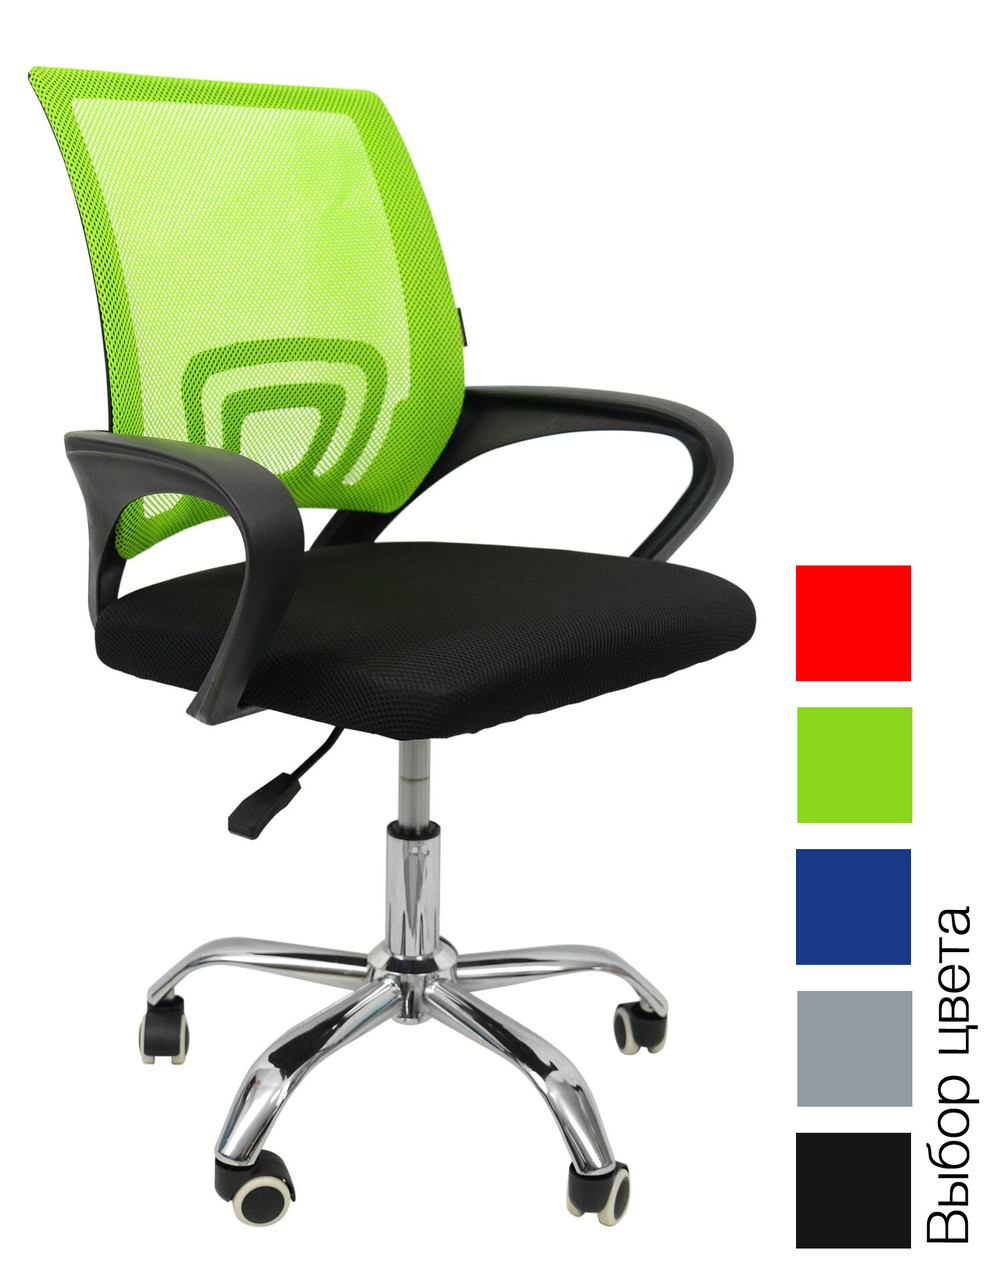 Офисное кресло компьютерное Bonro B-619 ( офісне крісло комп'ютерне ) Зелёный